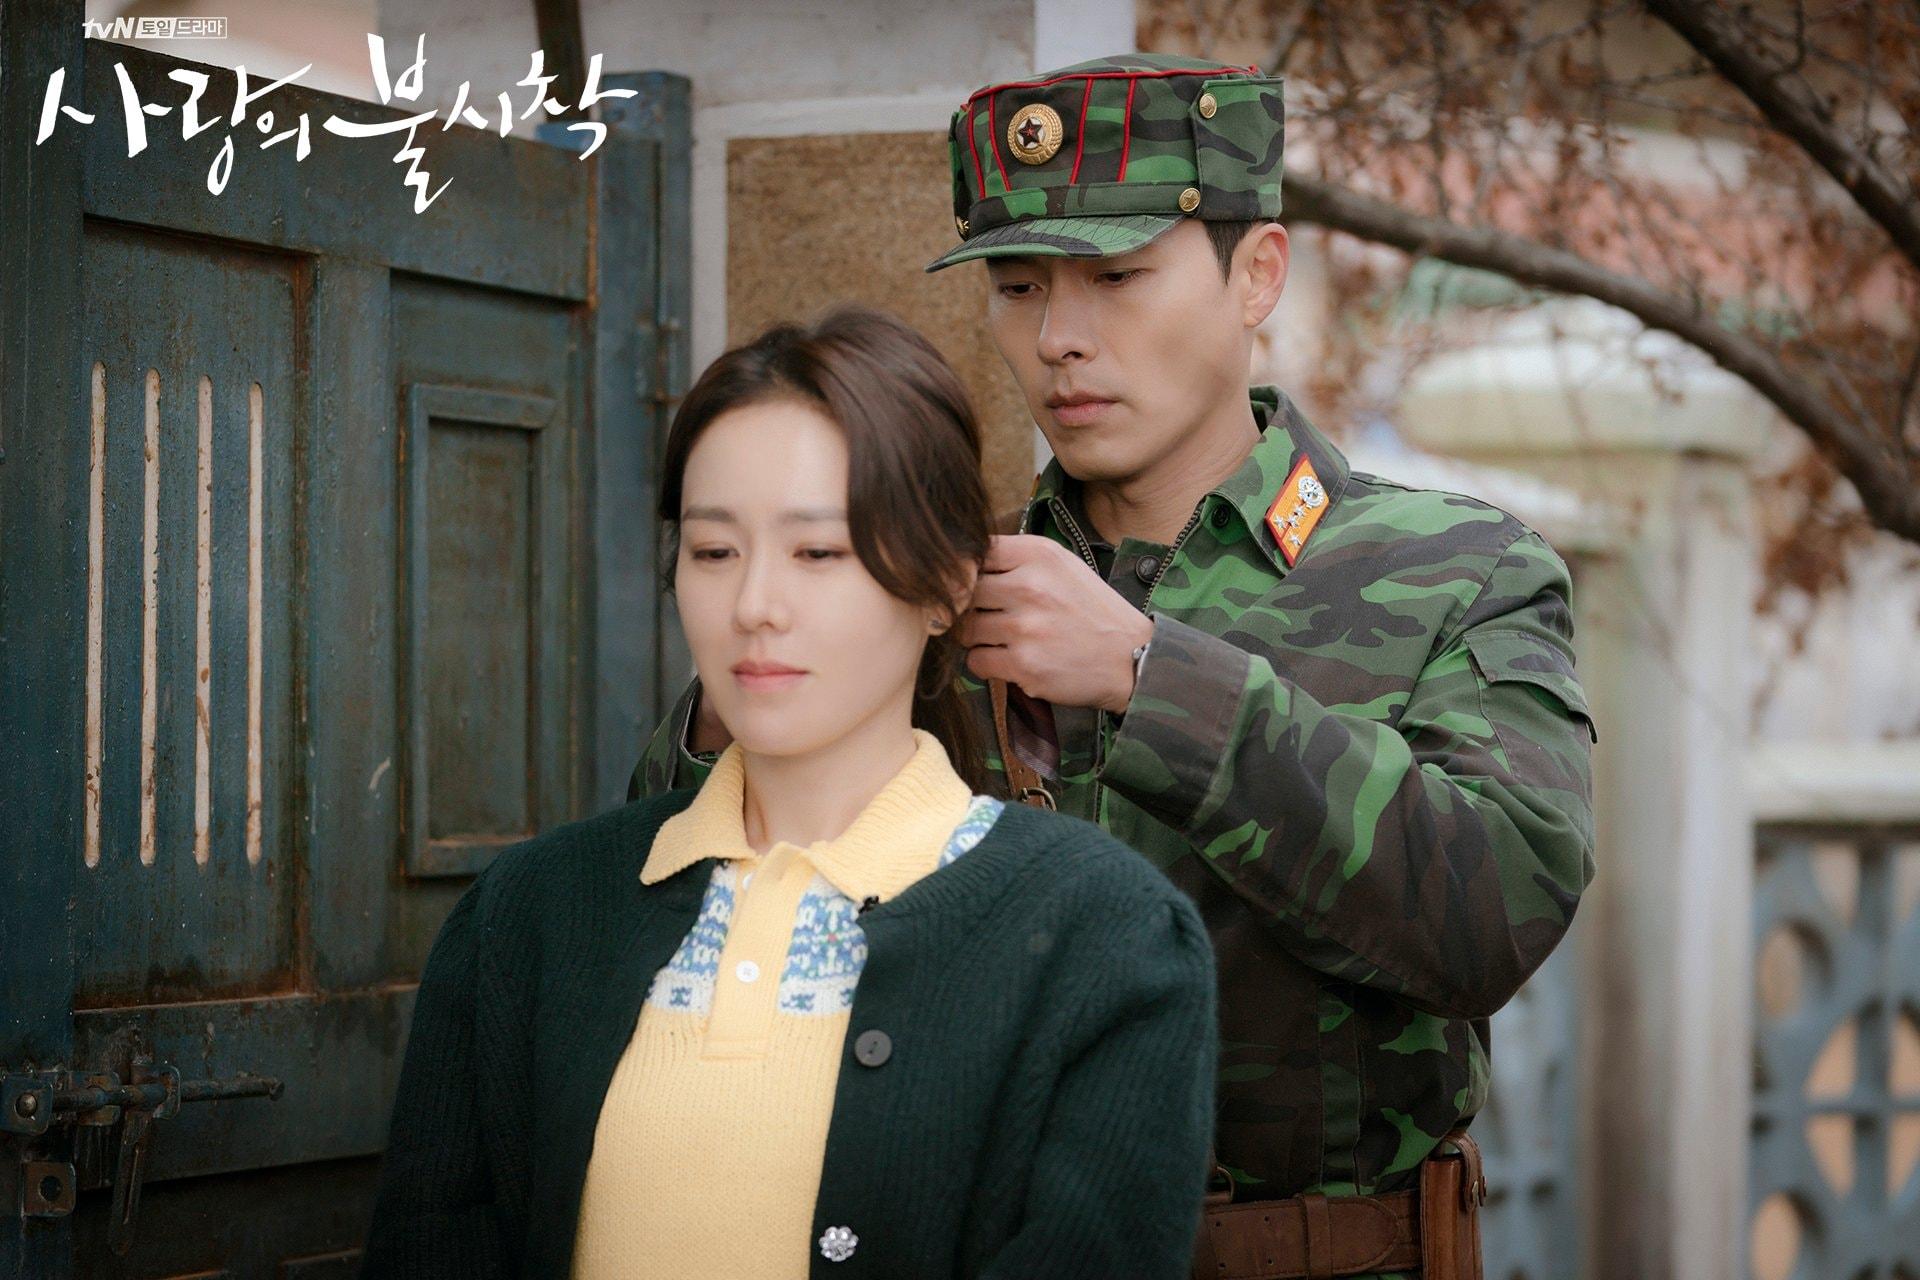 Image from Facebook Hyun Bin 현 빈 - International Fans